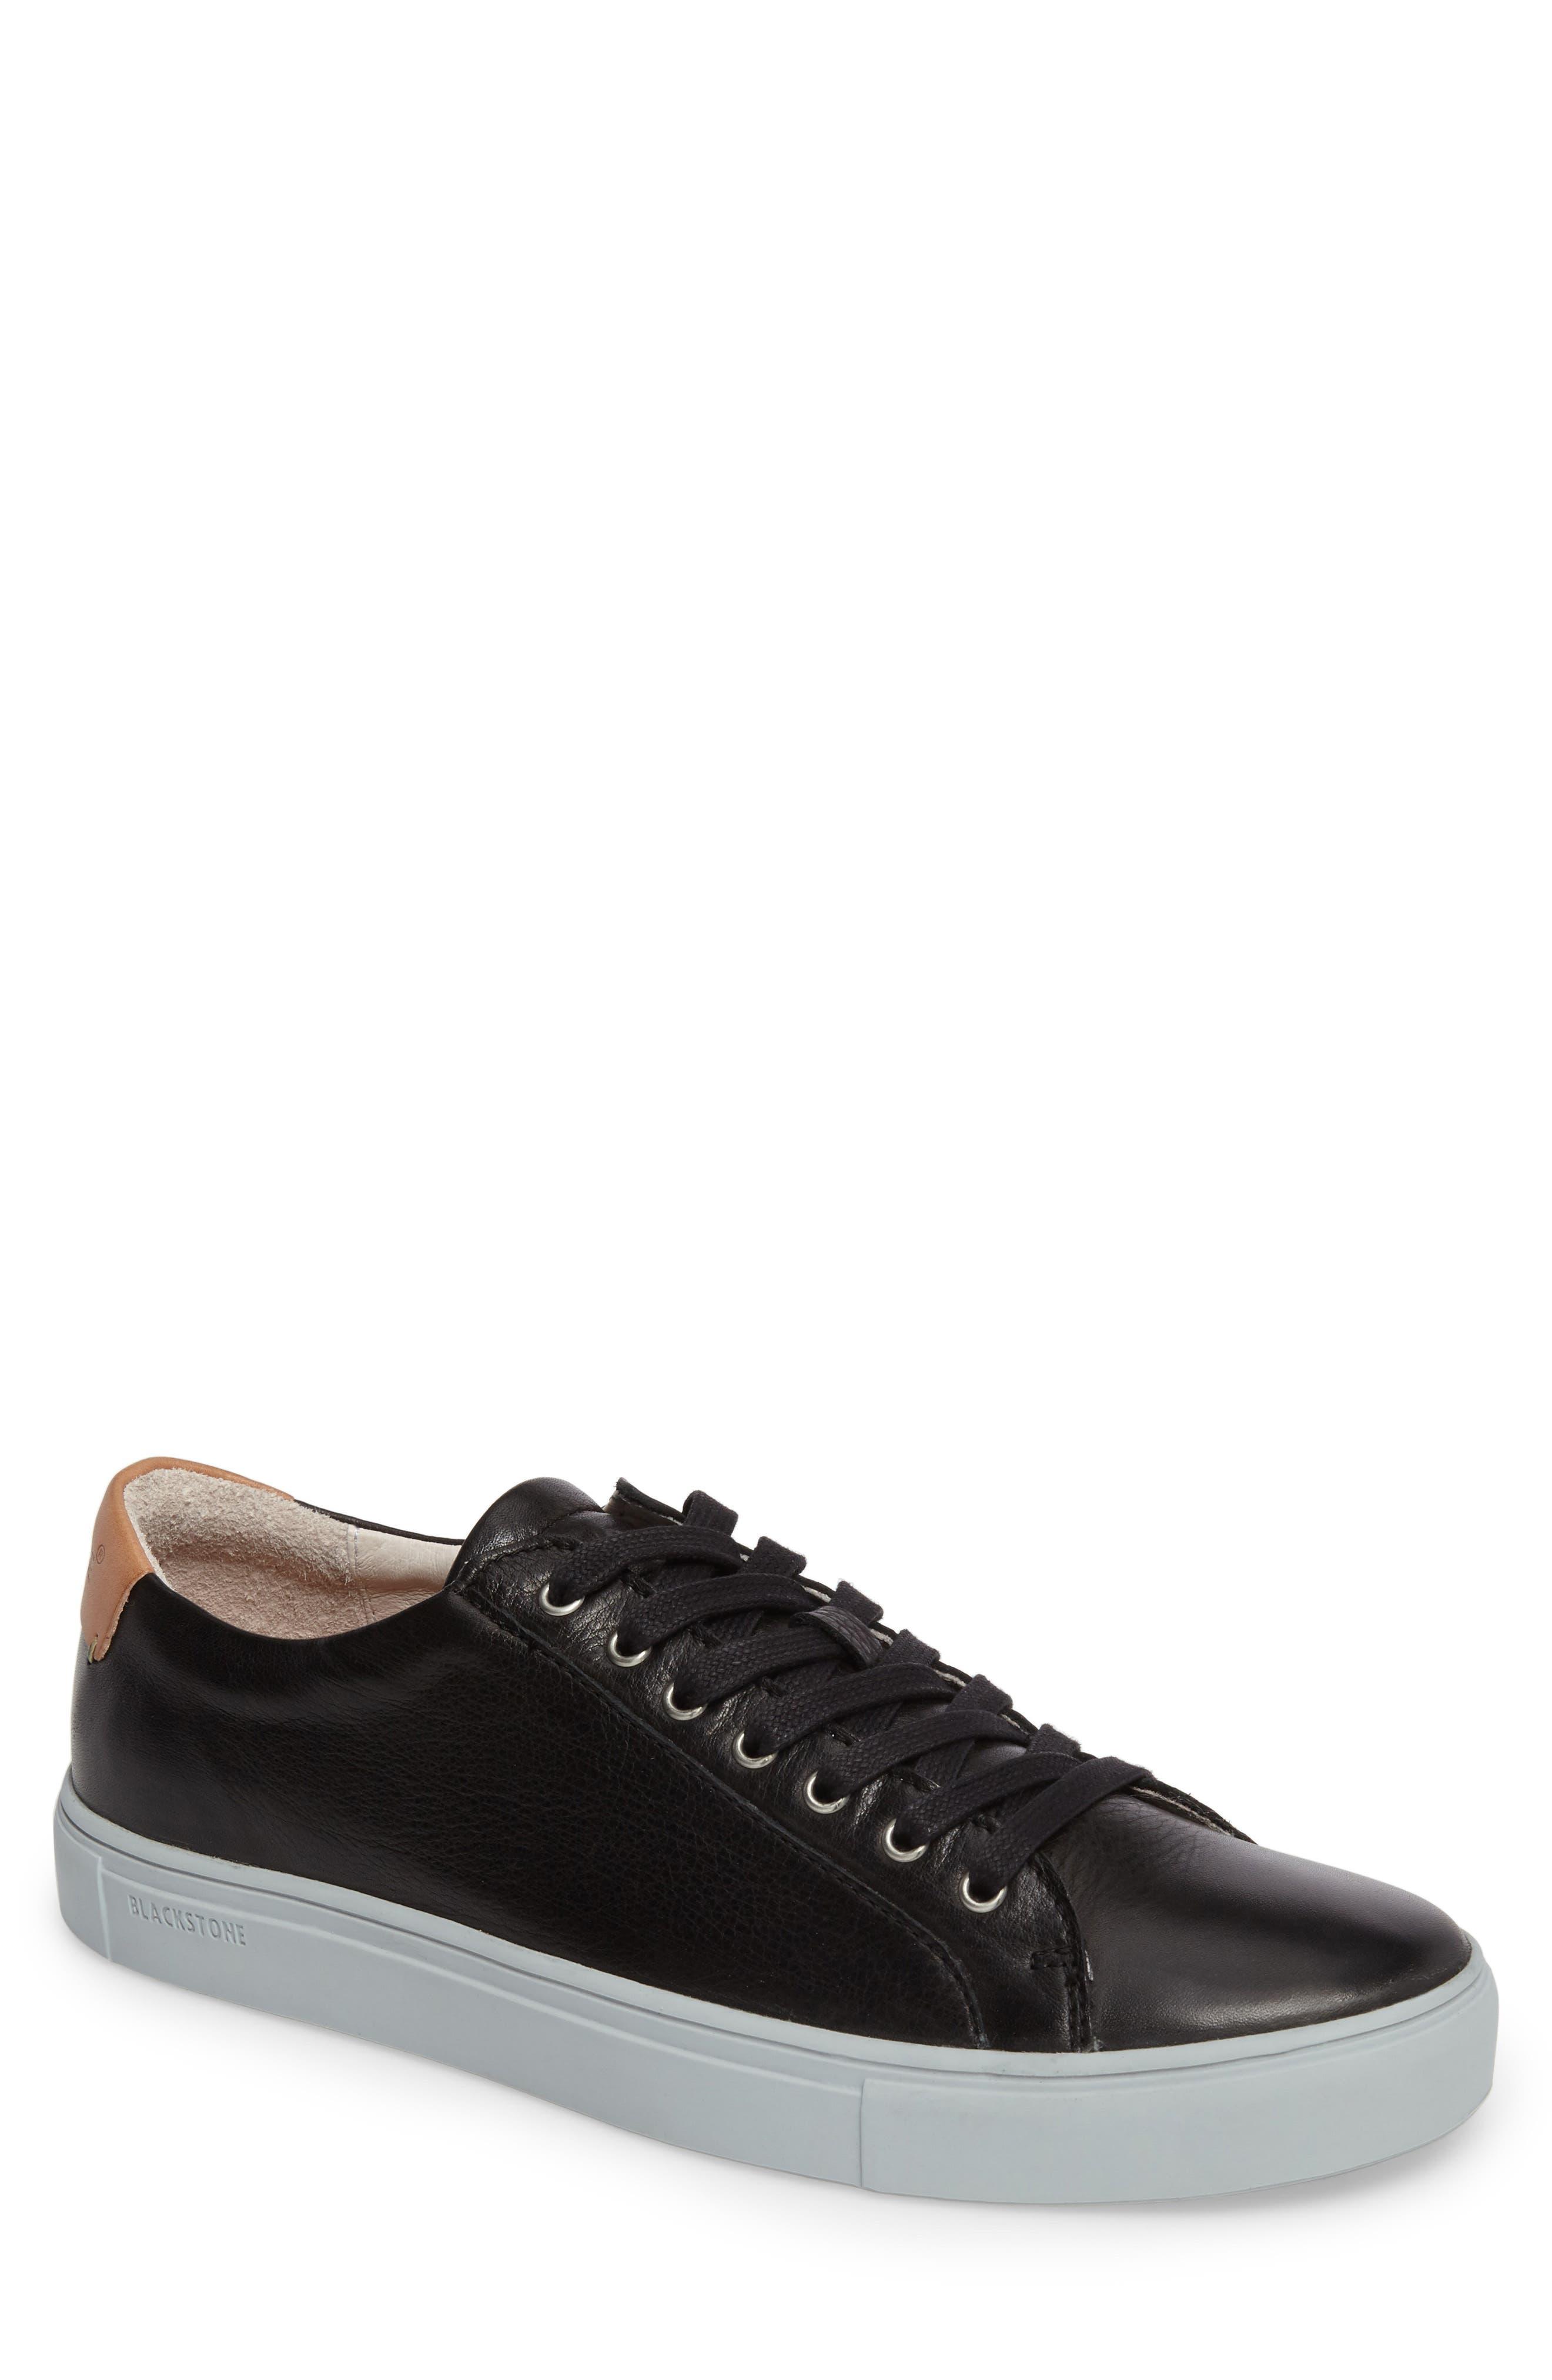 NM01 7 Eyelet Sneaker,                             Main thumbnail 1, color,                             BLACK LEATHER